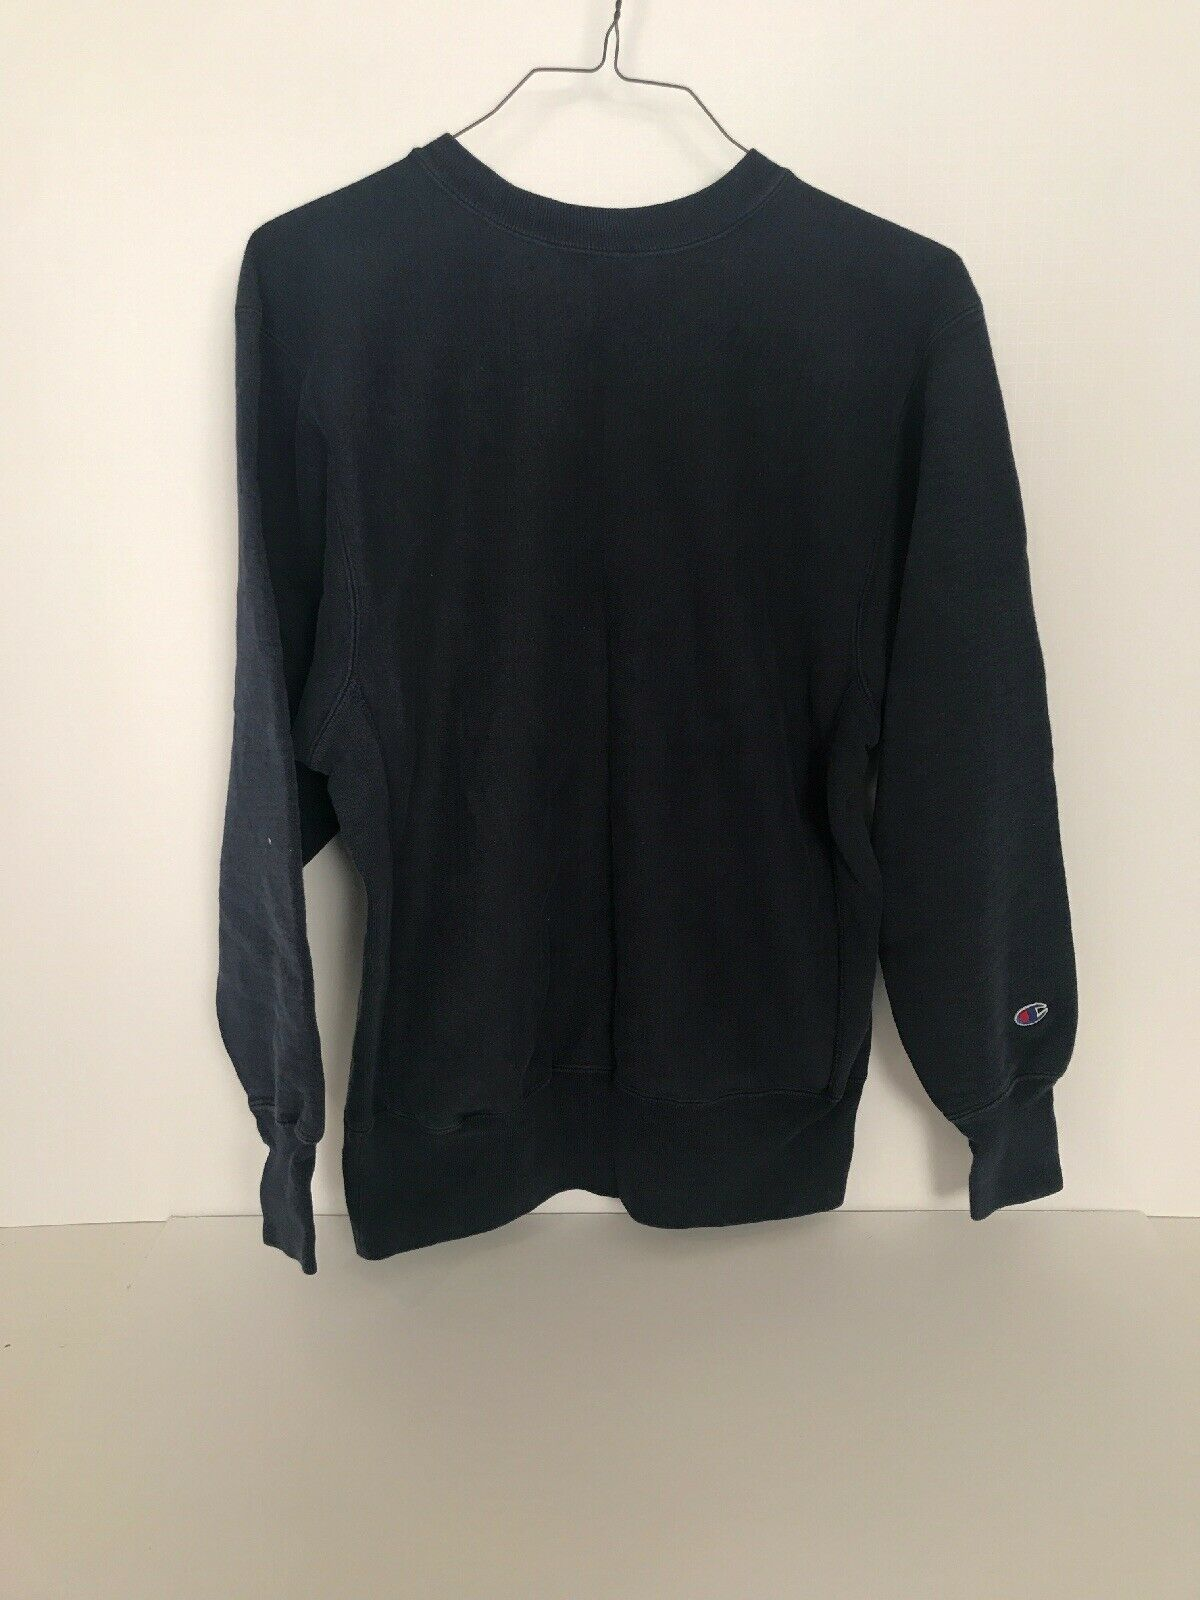 CHAMPION - Vtg 90s Navy Blau Crewneck Streetwear Sweatshirt measurements